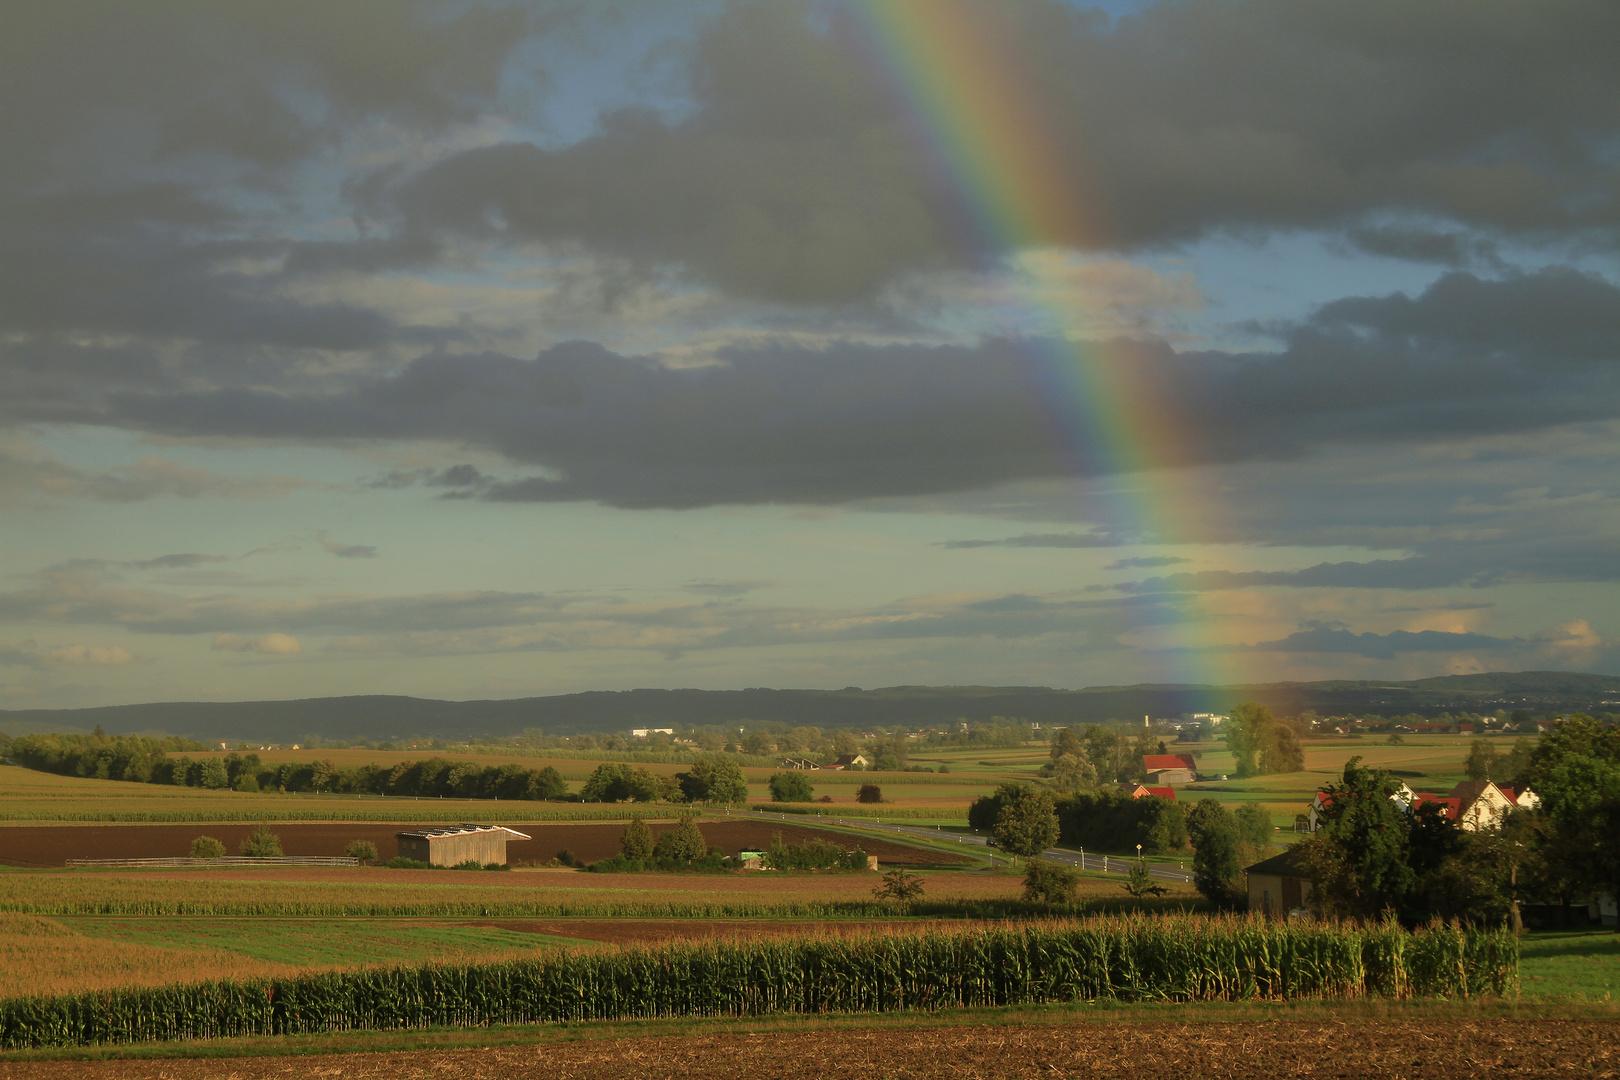 Somewhere over the rainbow........